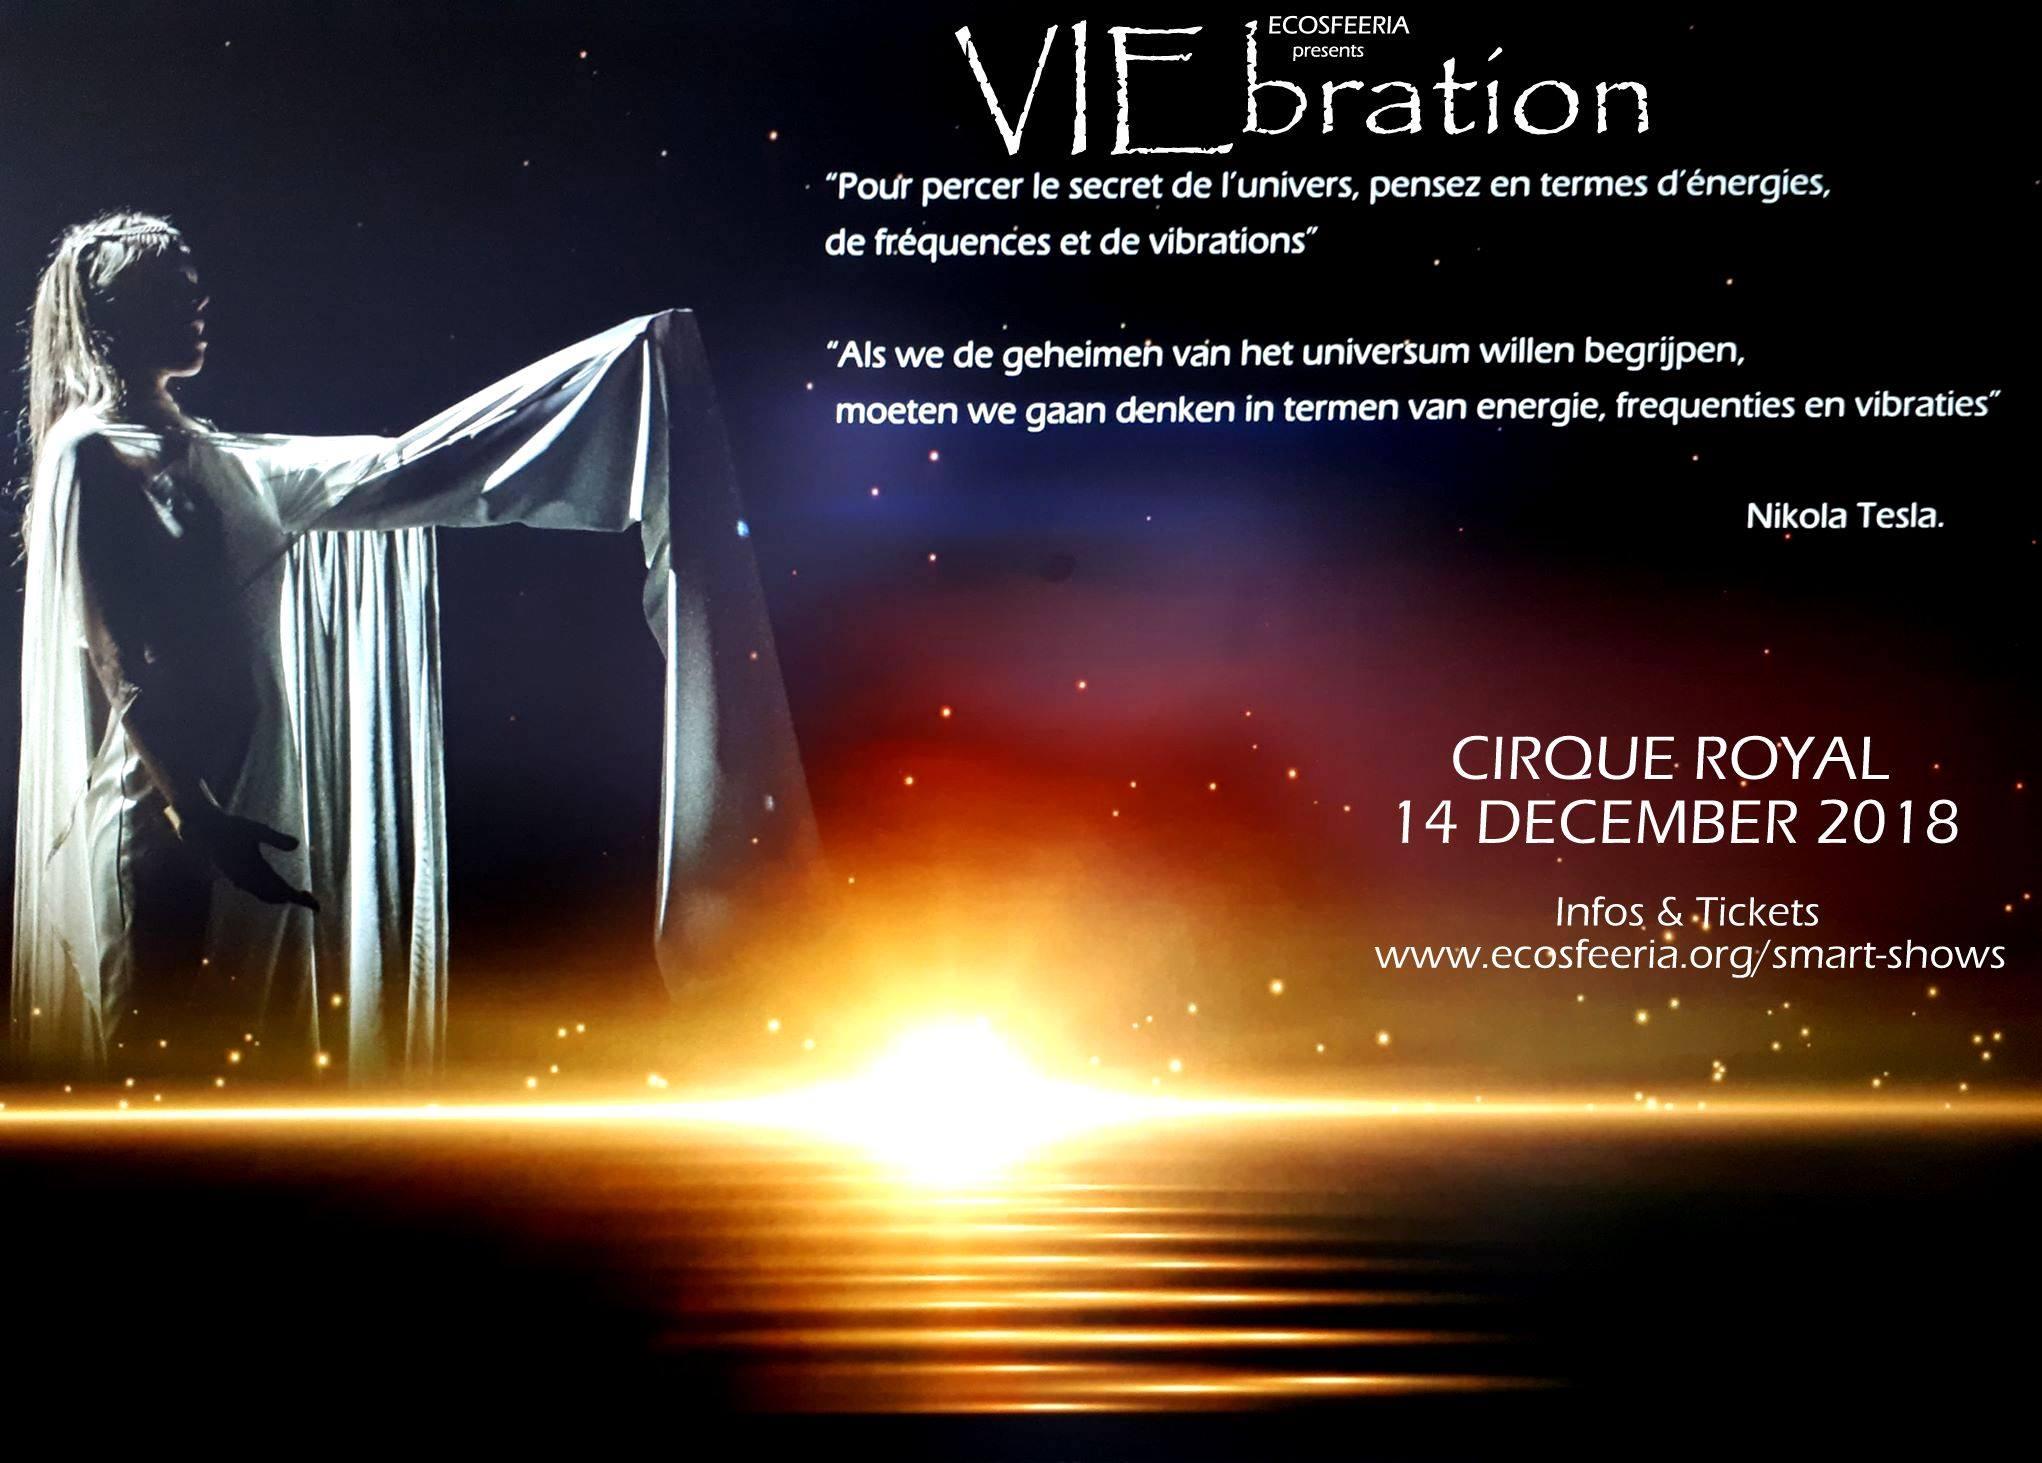 VIEbration